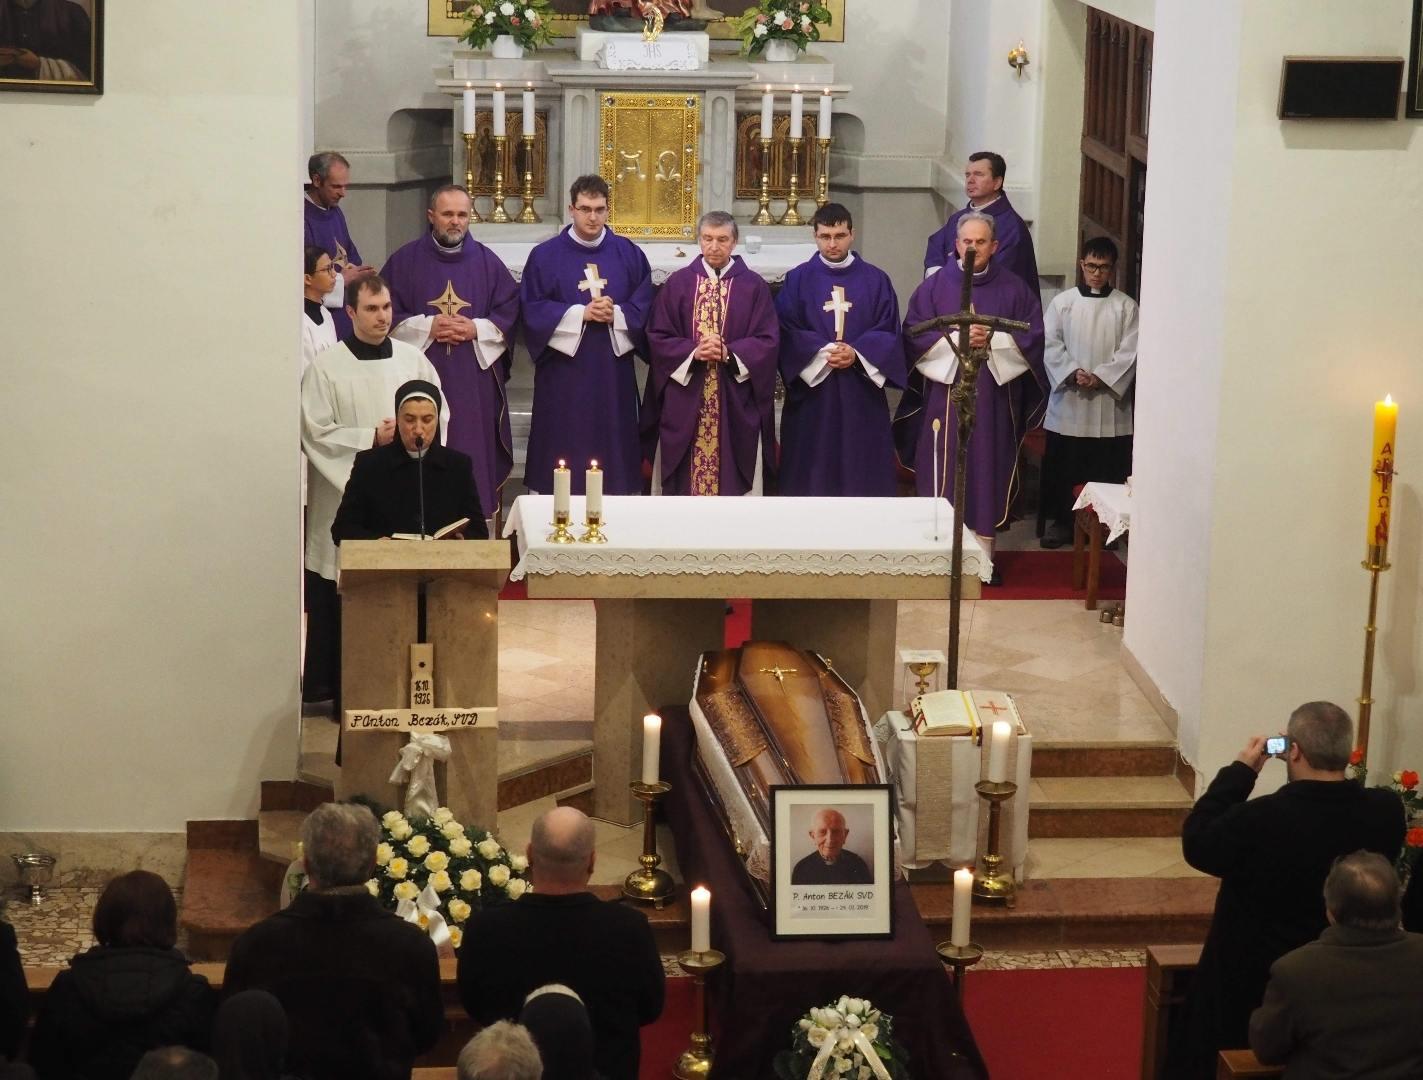 Pohreb vdp. Antona Bezáka - 29. januára 2019